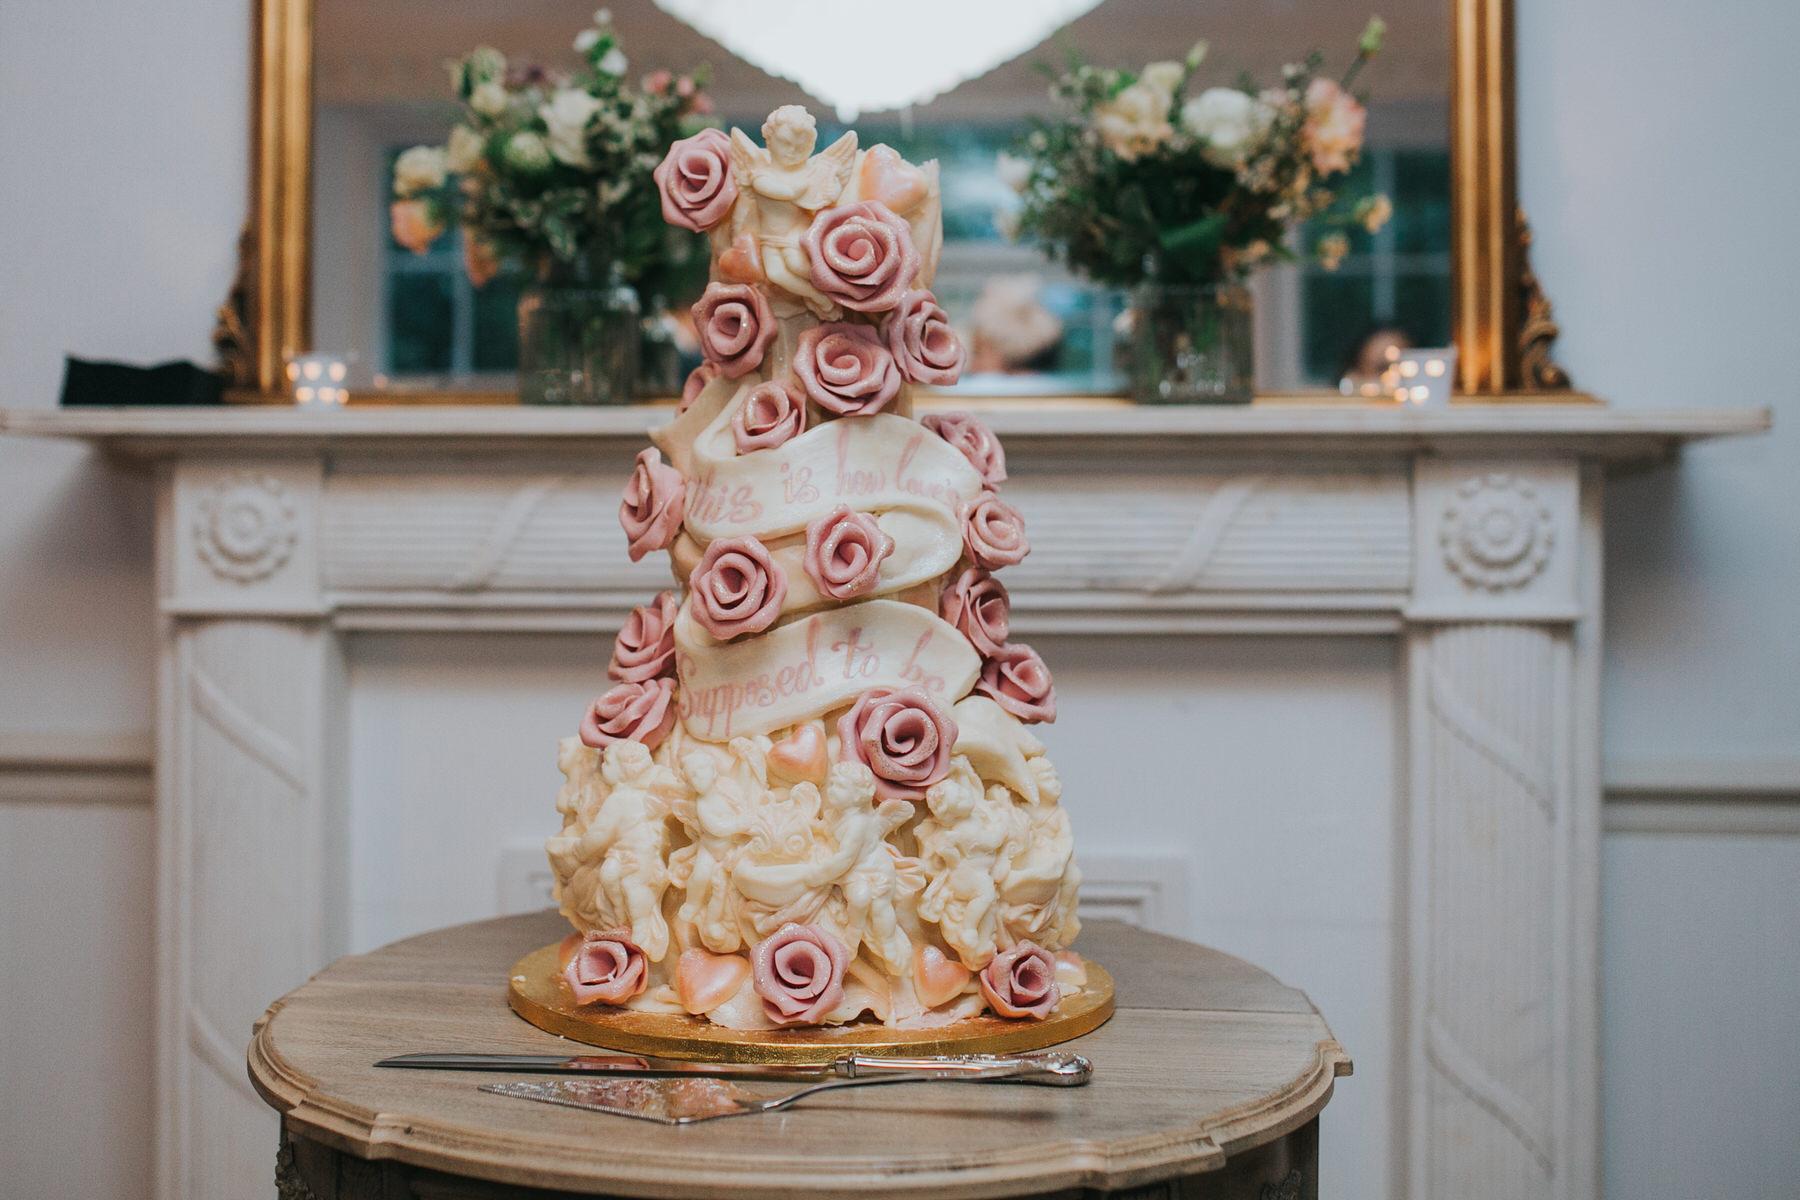 Choccywoccydoodah wedding cake pink roses cream cherubs.jpg